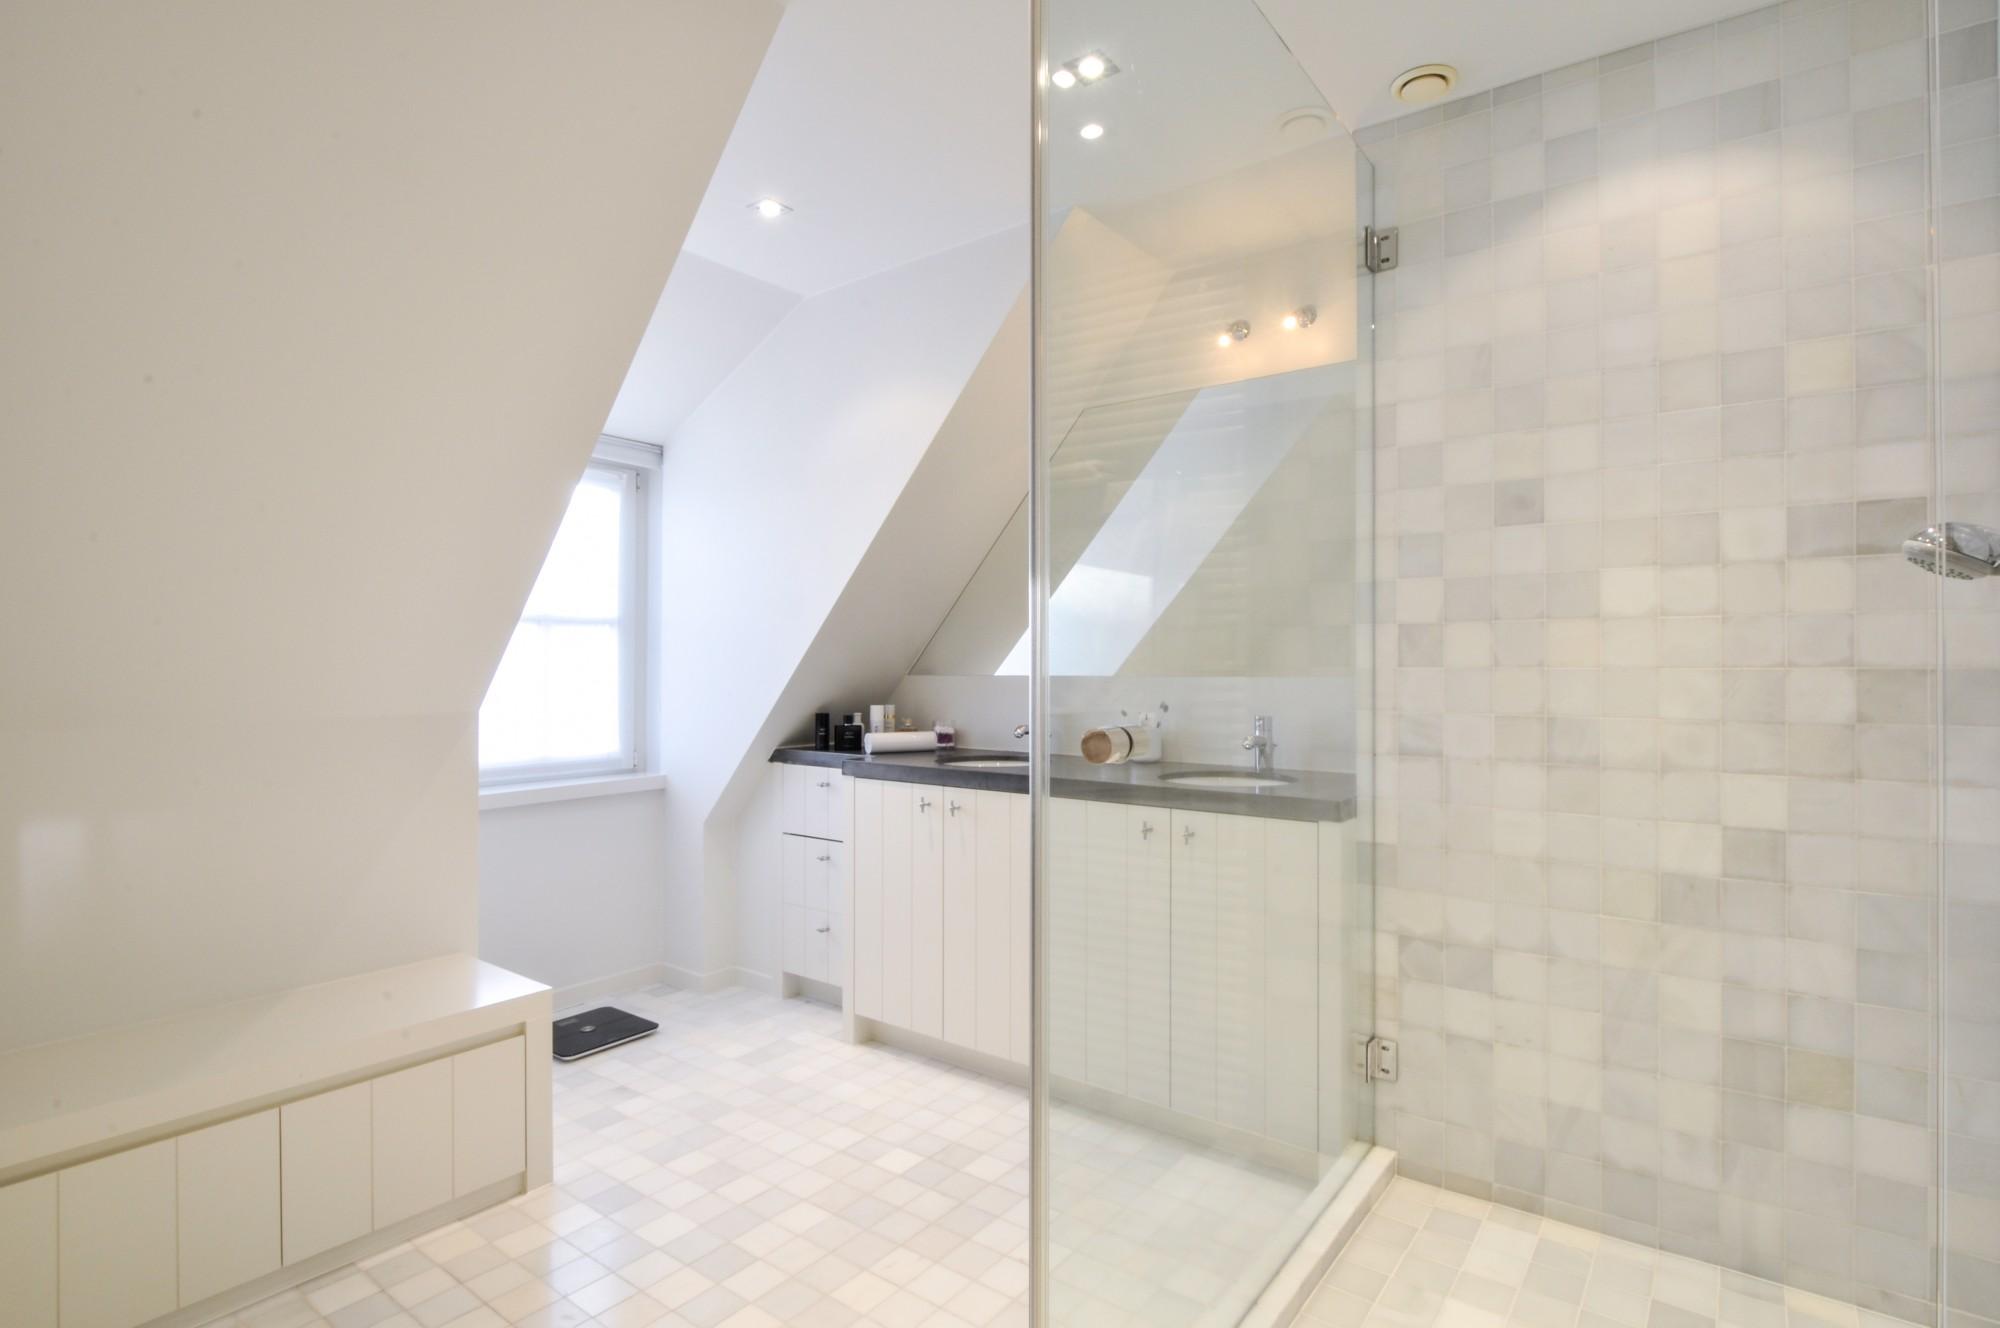 locations appartement t4 f4 knokke heist hoekappartement duplex met mezzanine christophe. Black Bedroom Furniture Sets. Home Design Ideas